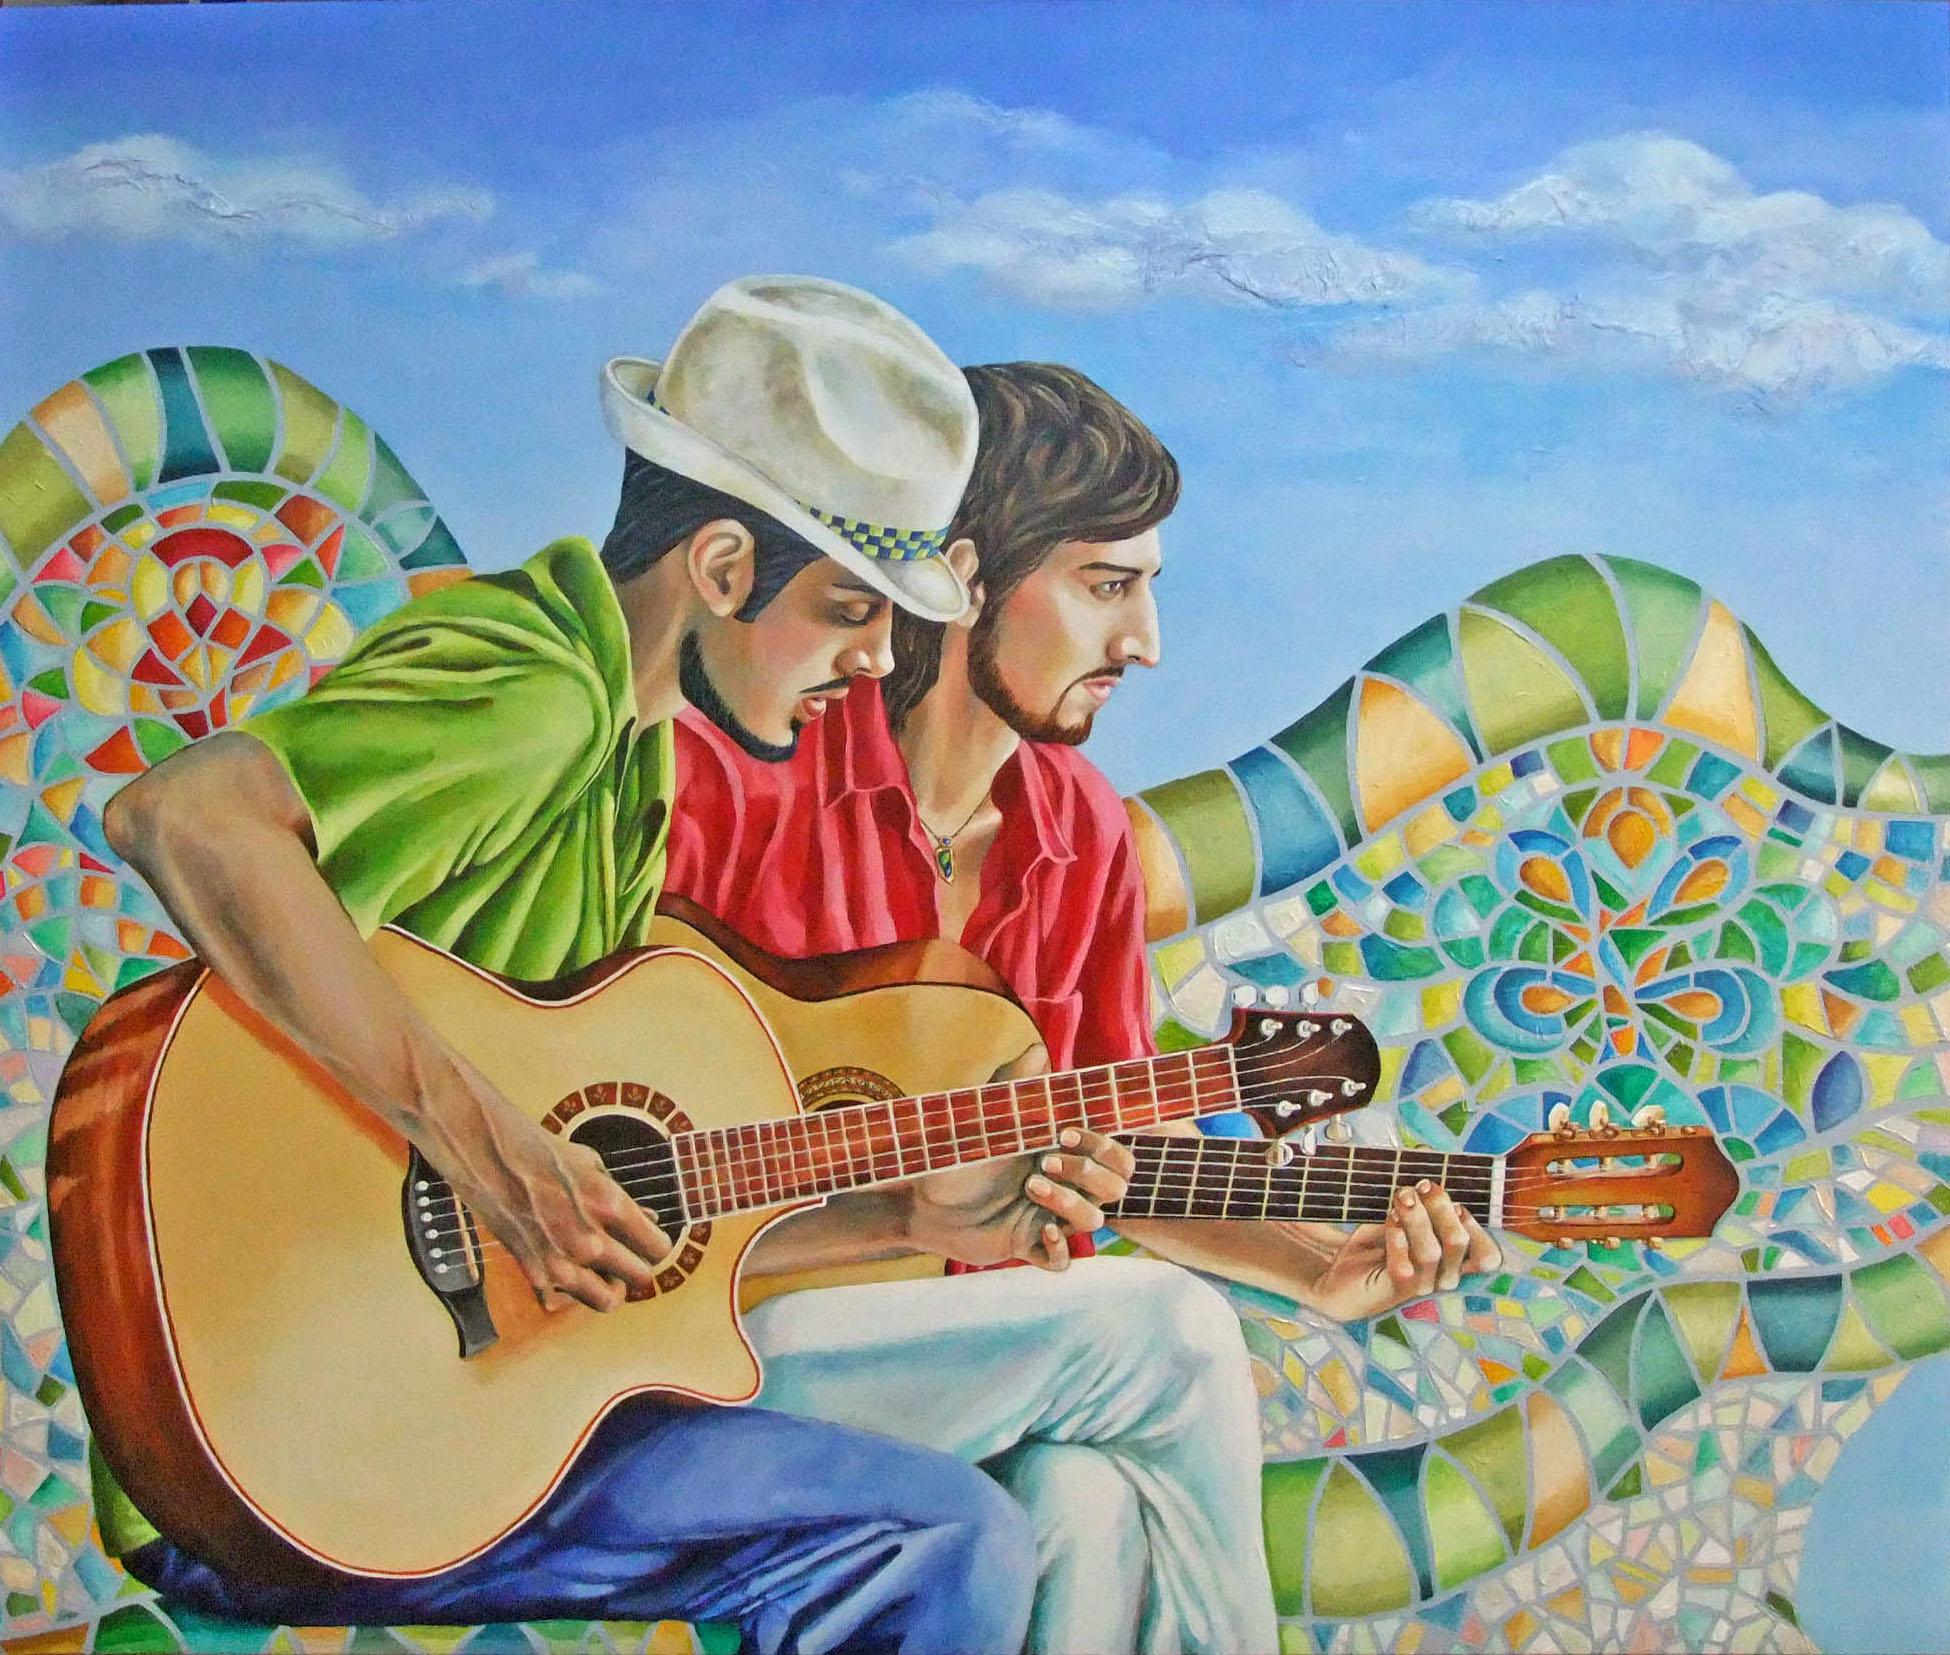 Les guitaristes du parc Guëll